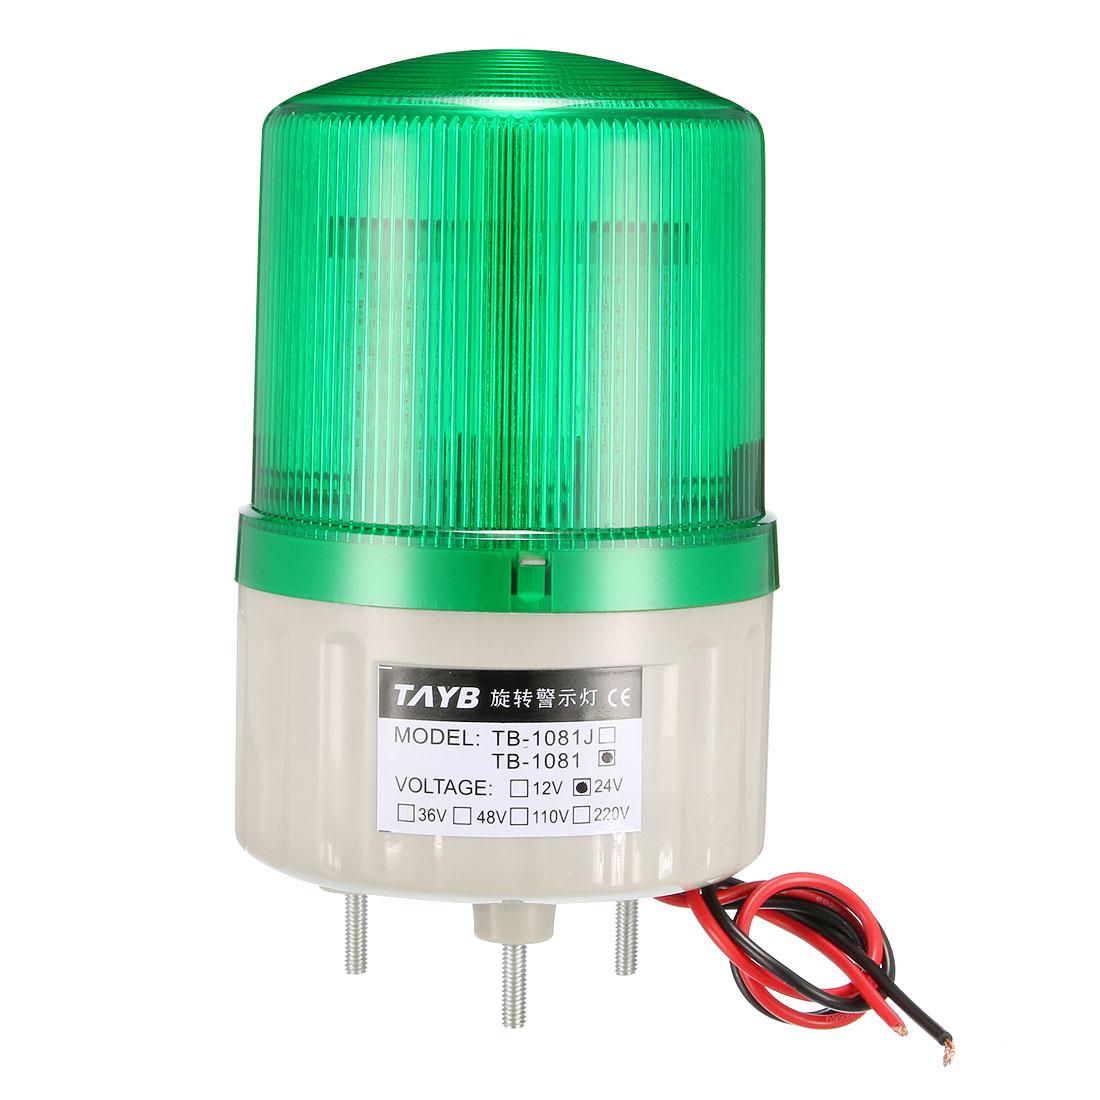 LED Warning Light Bulb Bright Industrial Signal Alarm Lamp DC24V Green TB-1081